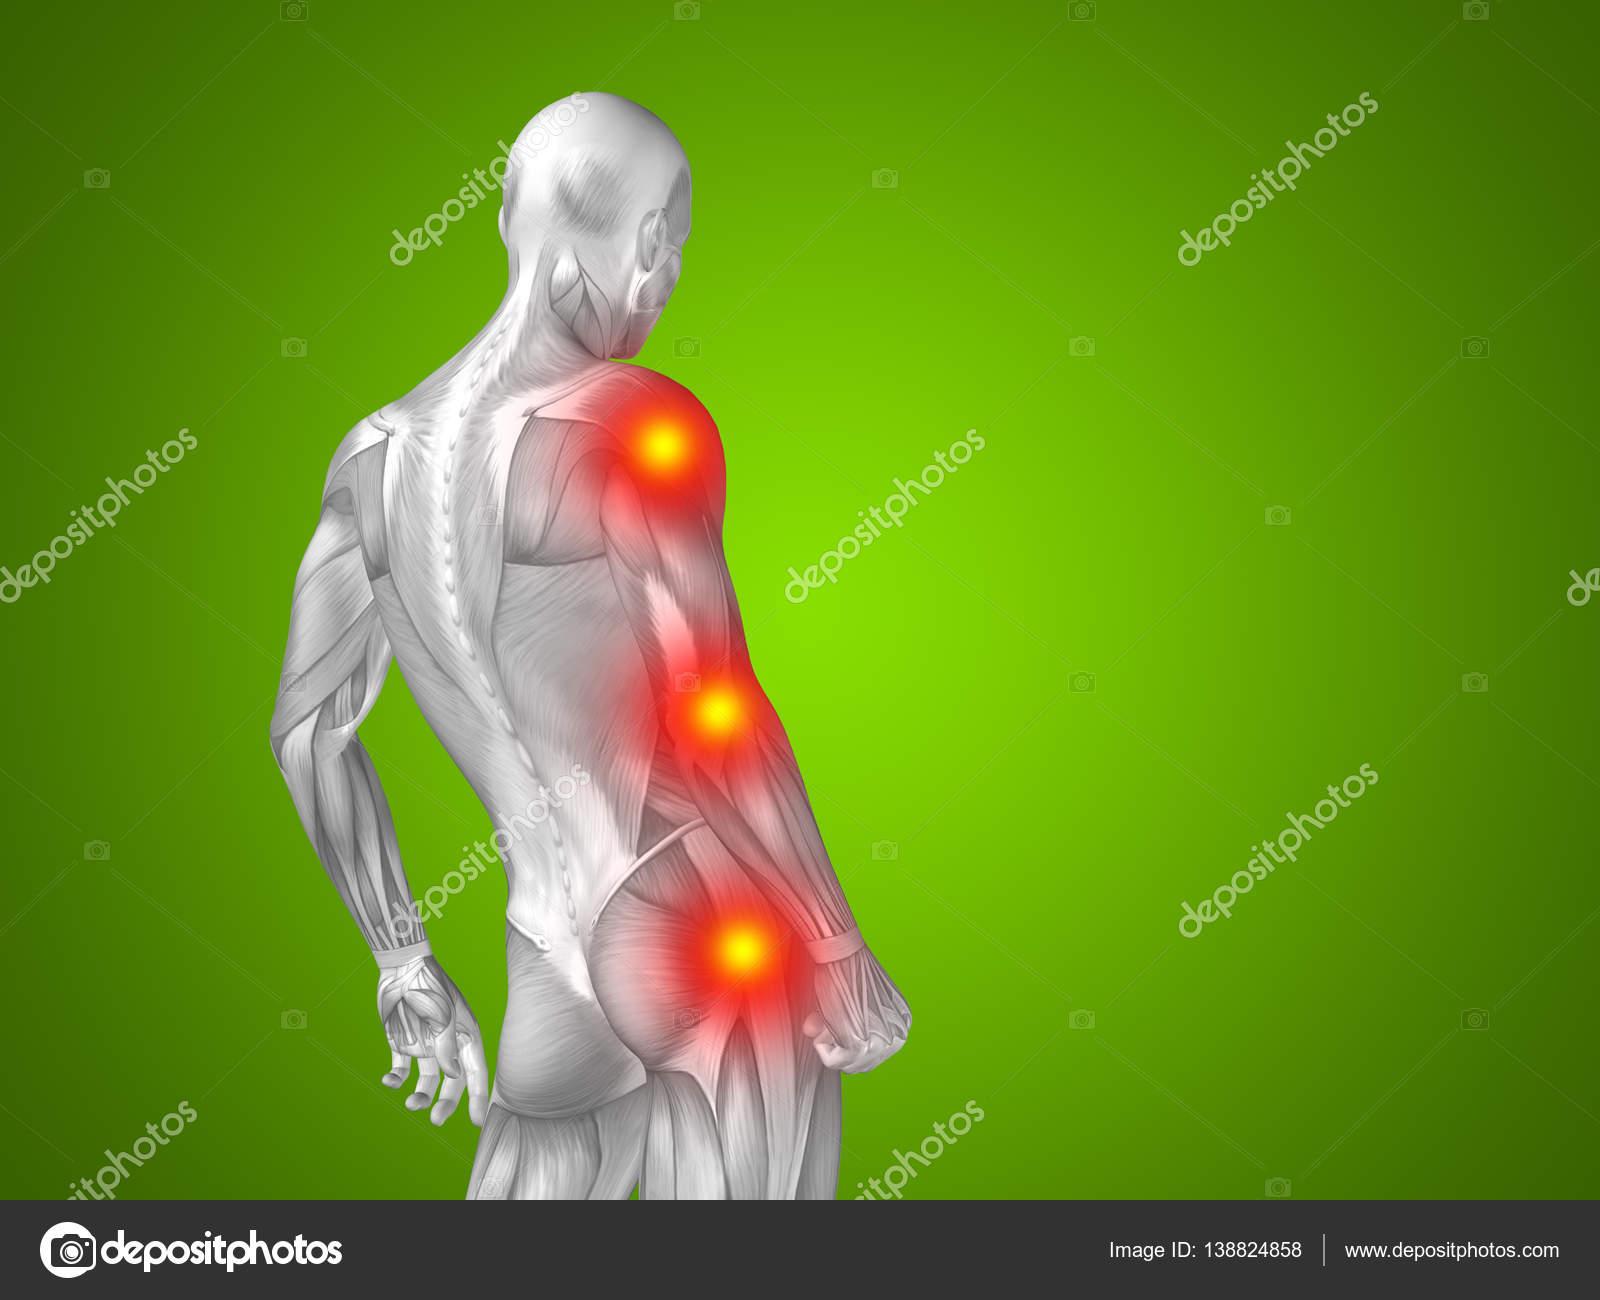 Human Upper Body Anatomy Stock Photo Design36 138824858